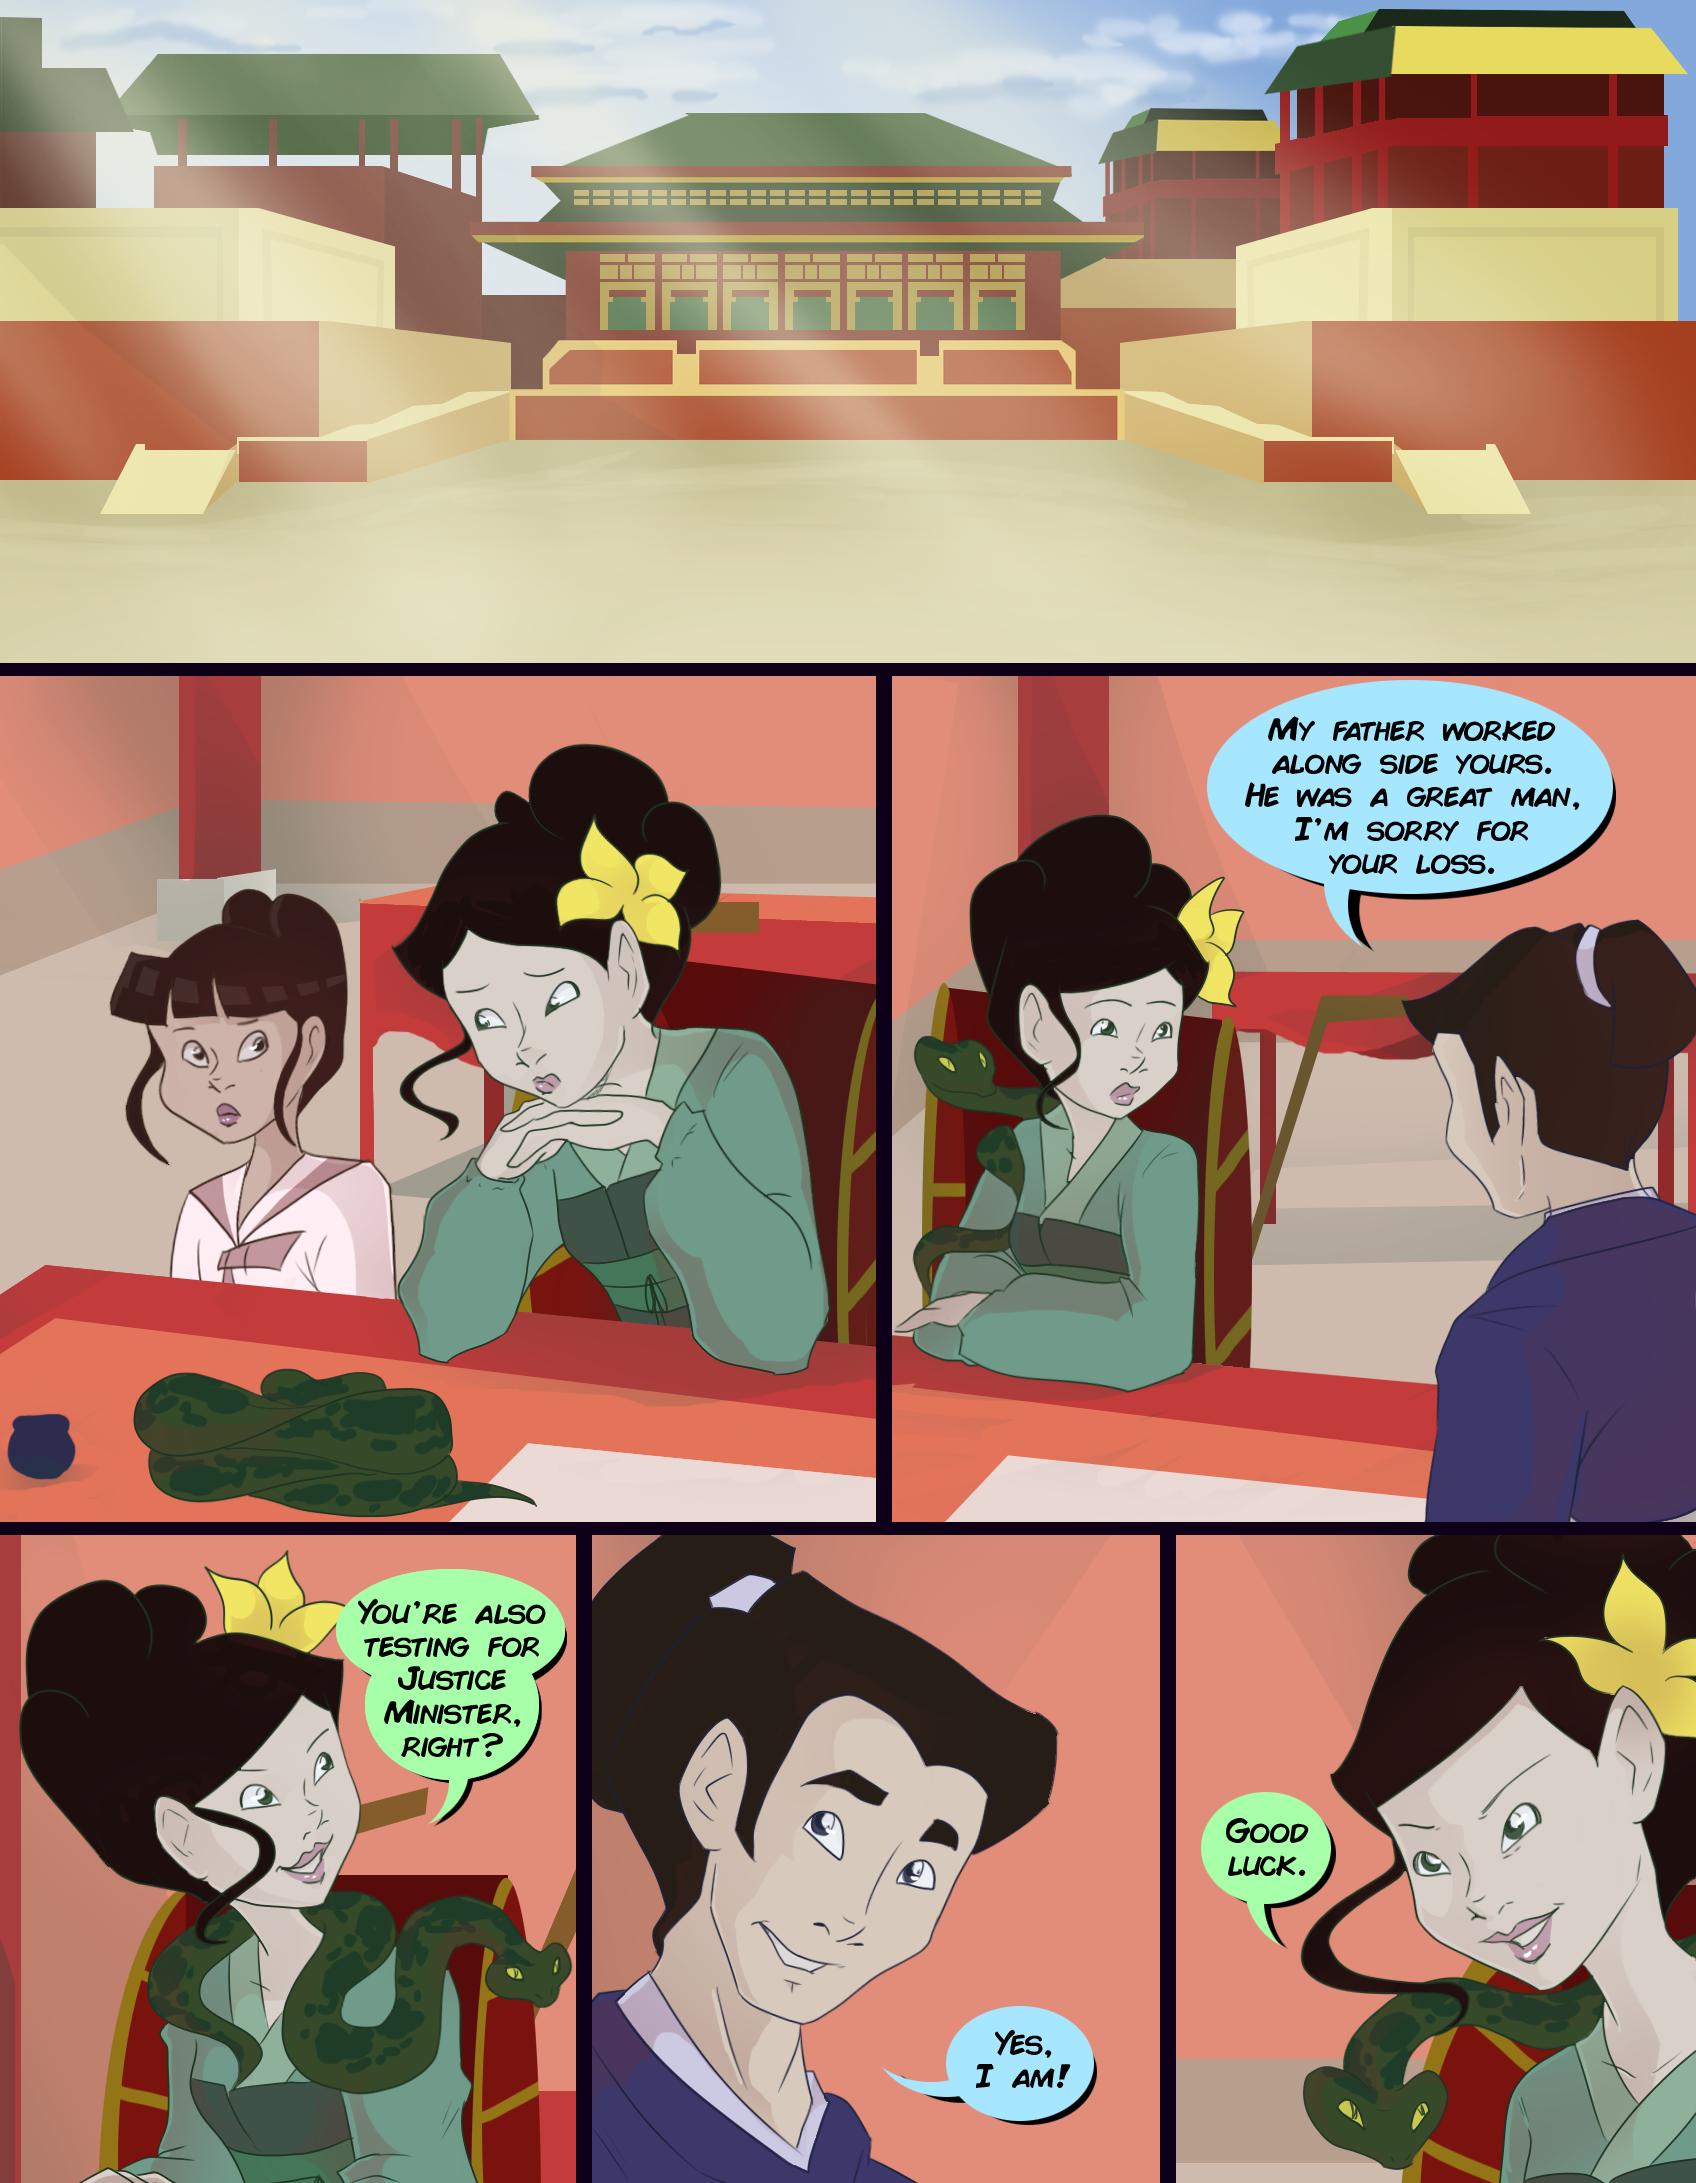 Patricia Page 63